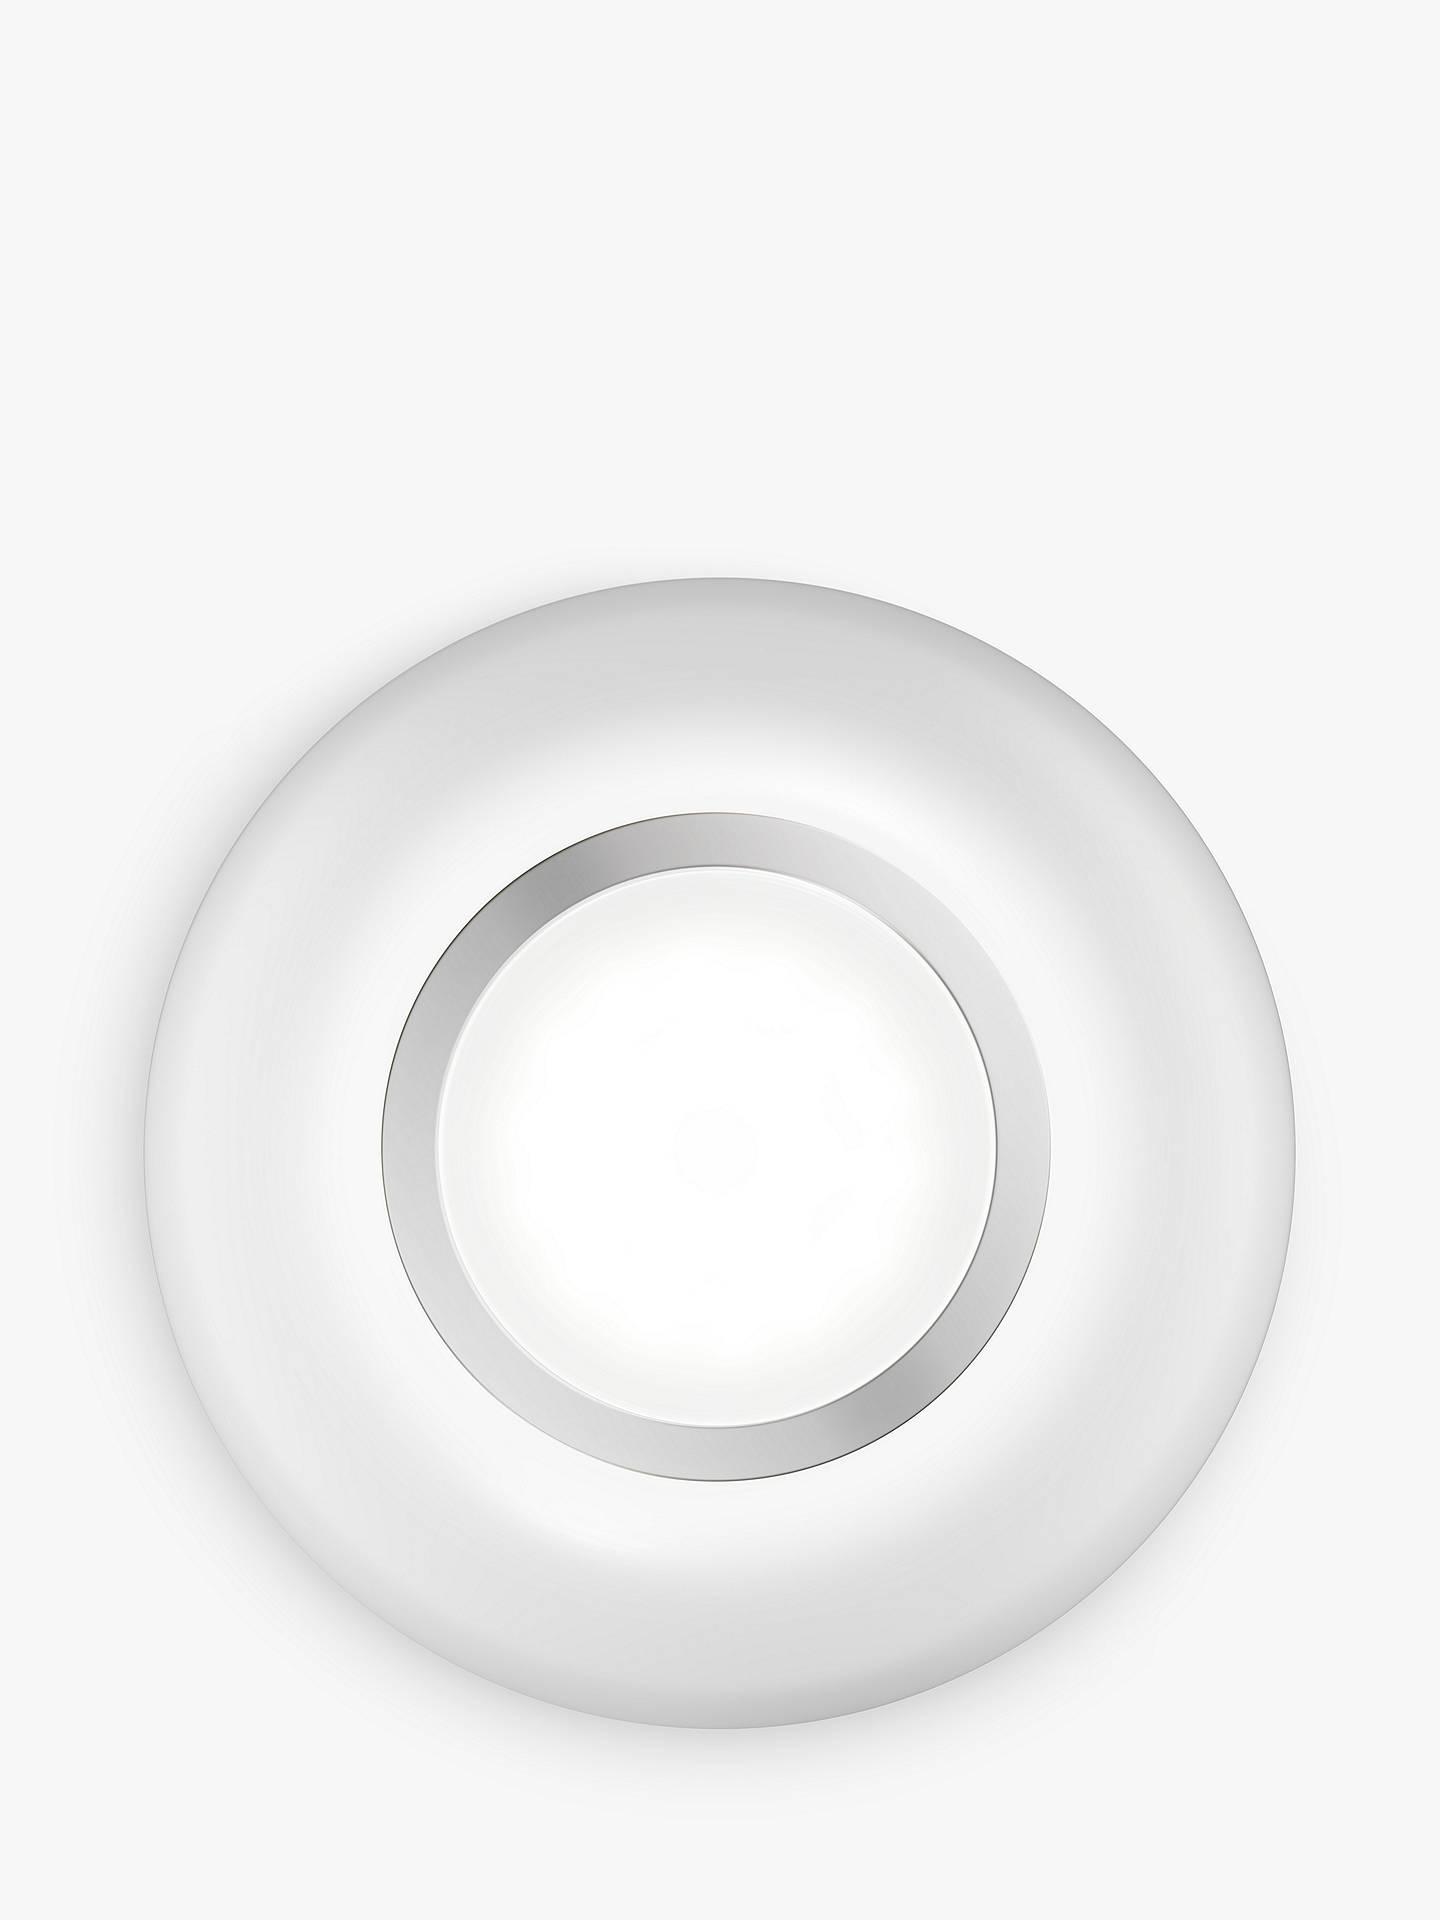 John Lewis Partners Lambda Circle Surface Recessed Led Light Kit Pack Of 2 White